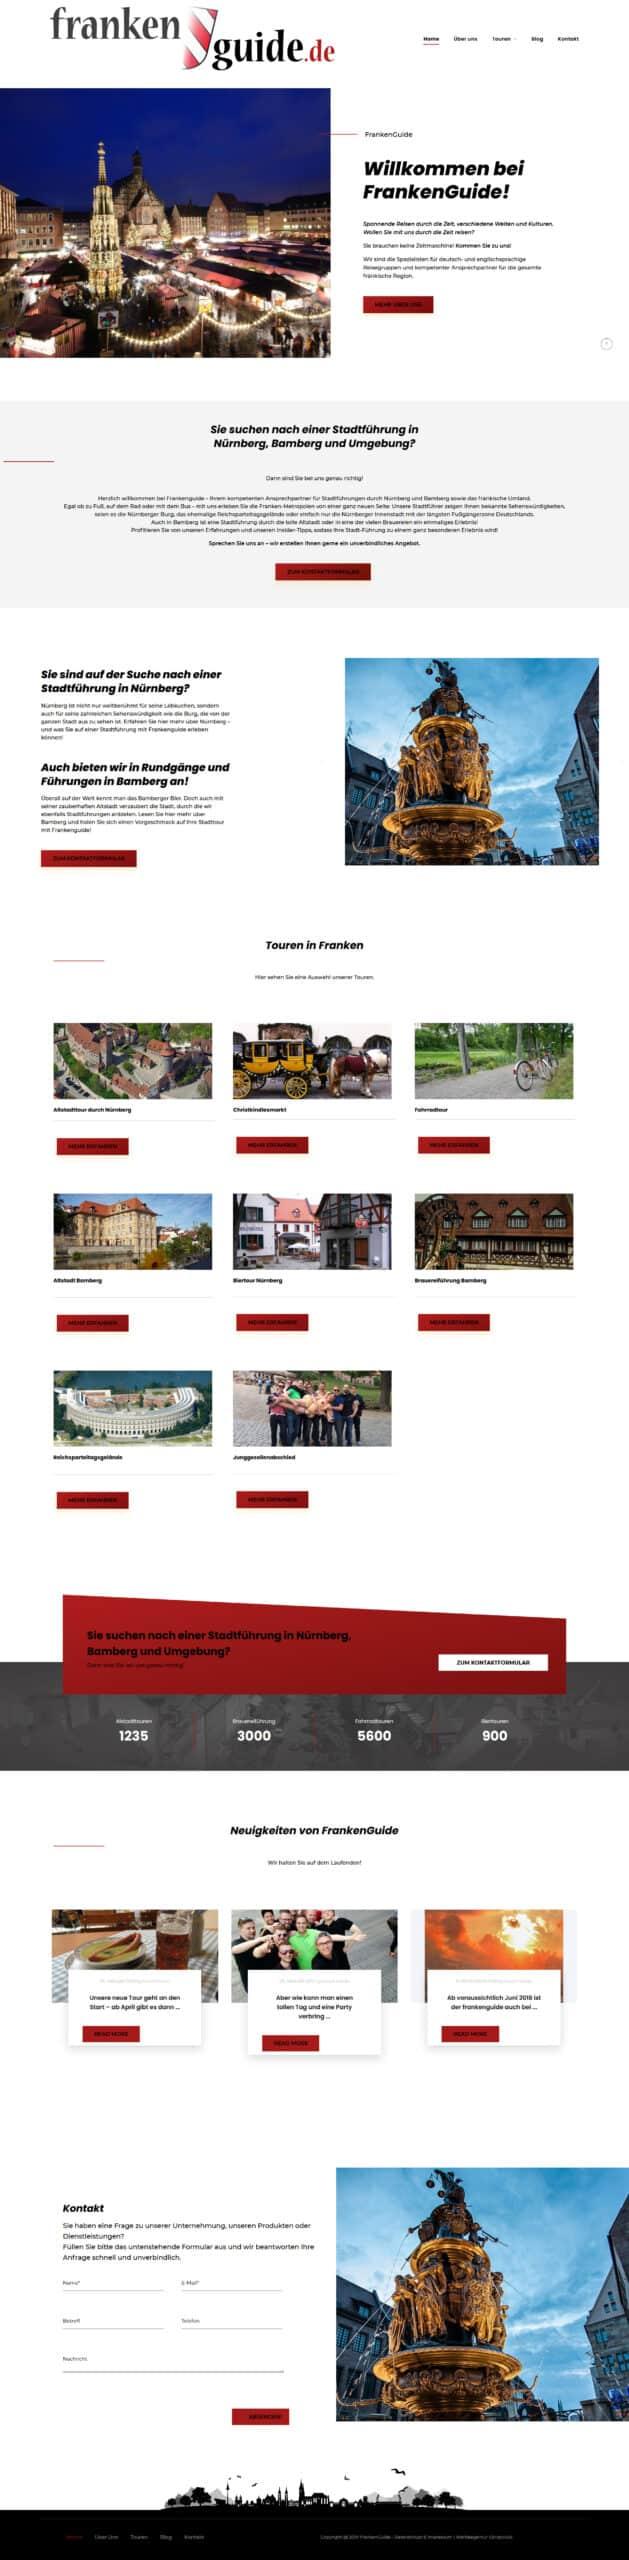 Franken Guide Stadtführung in Nürnberg